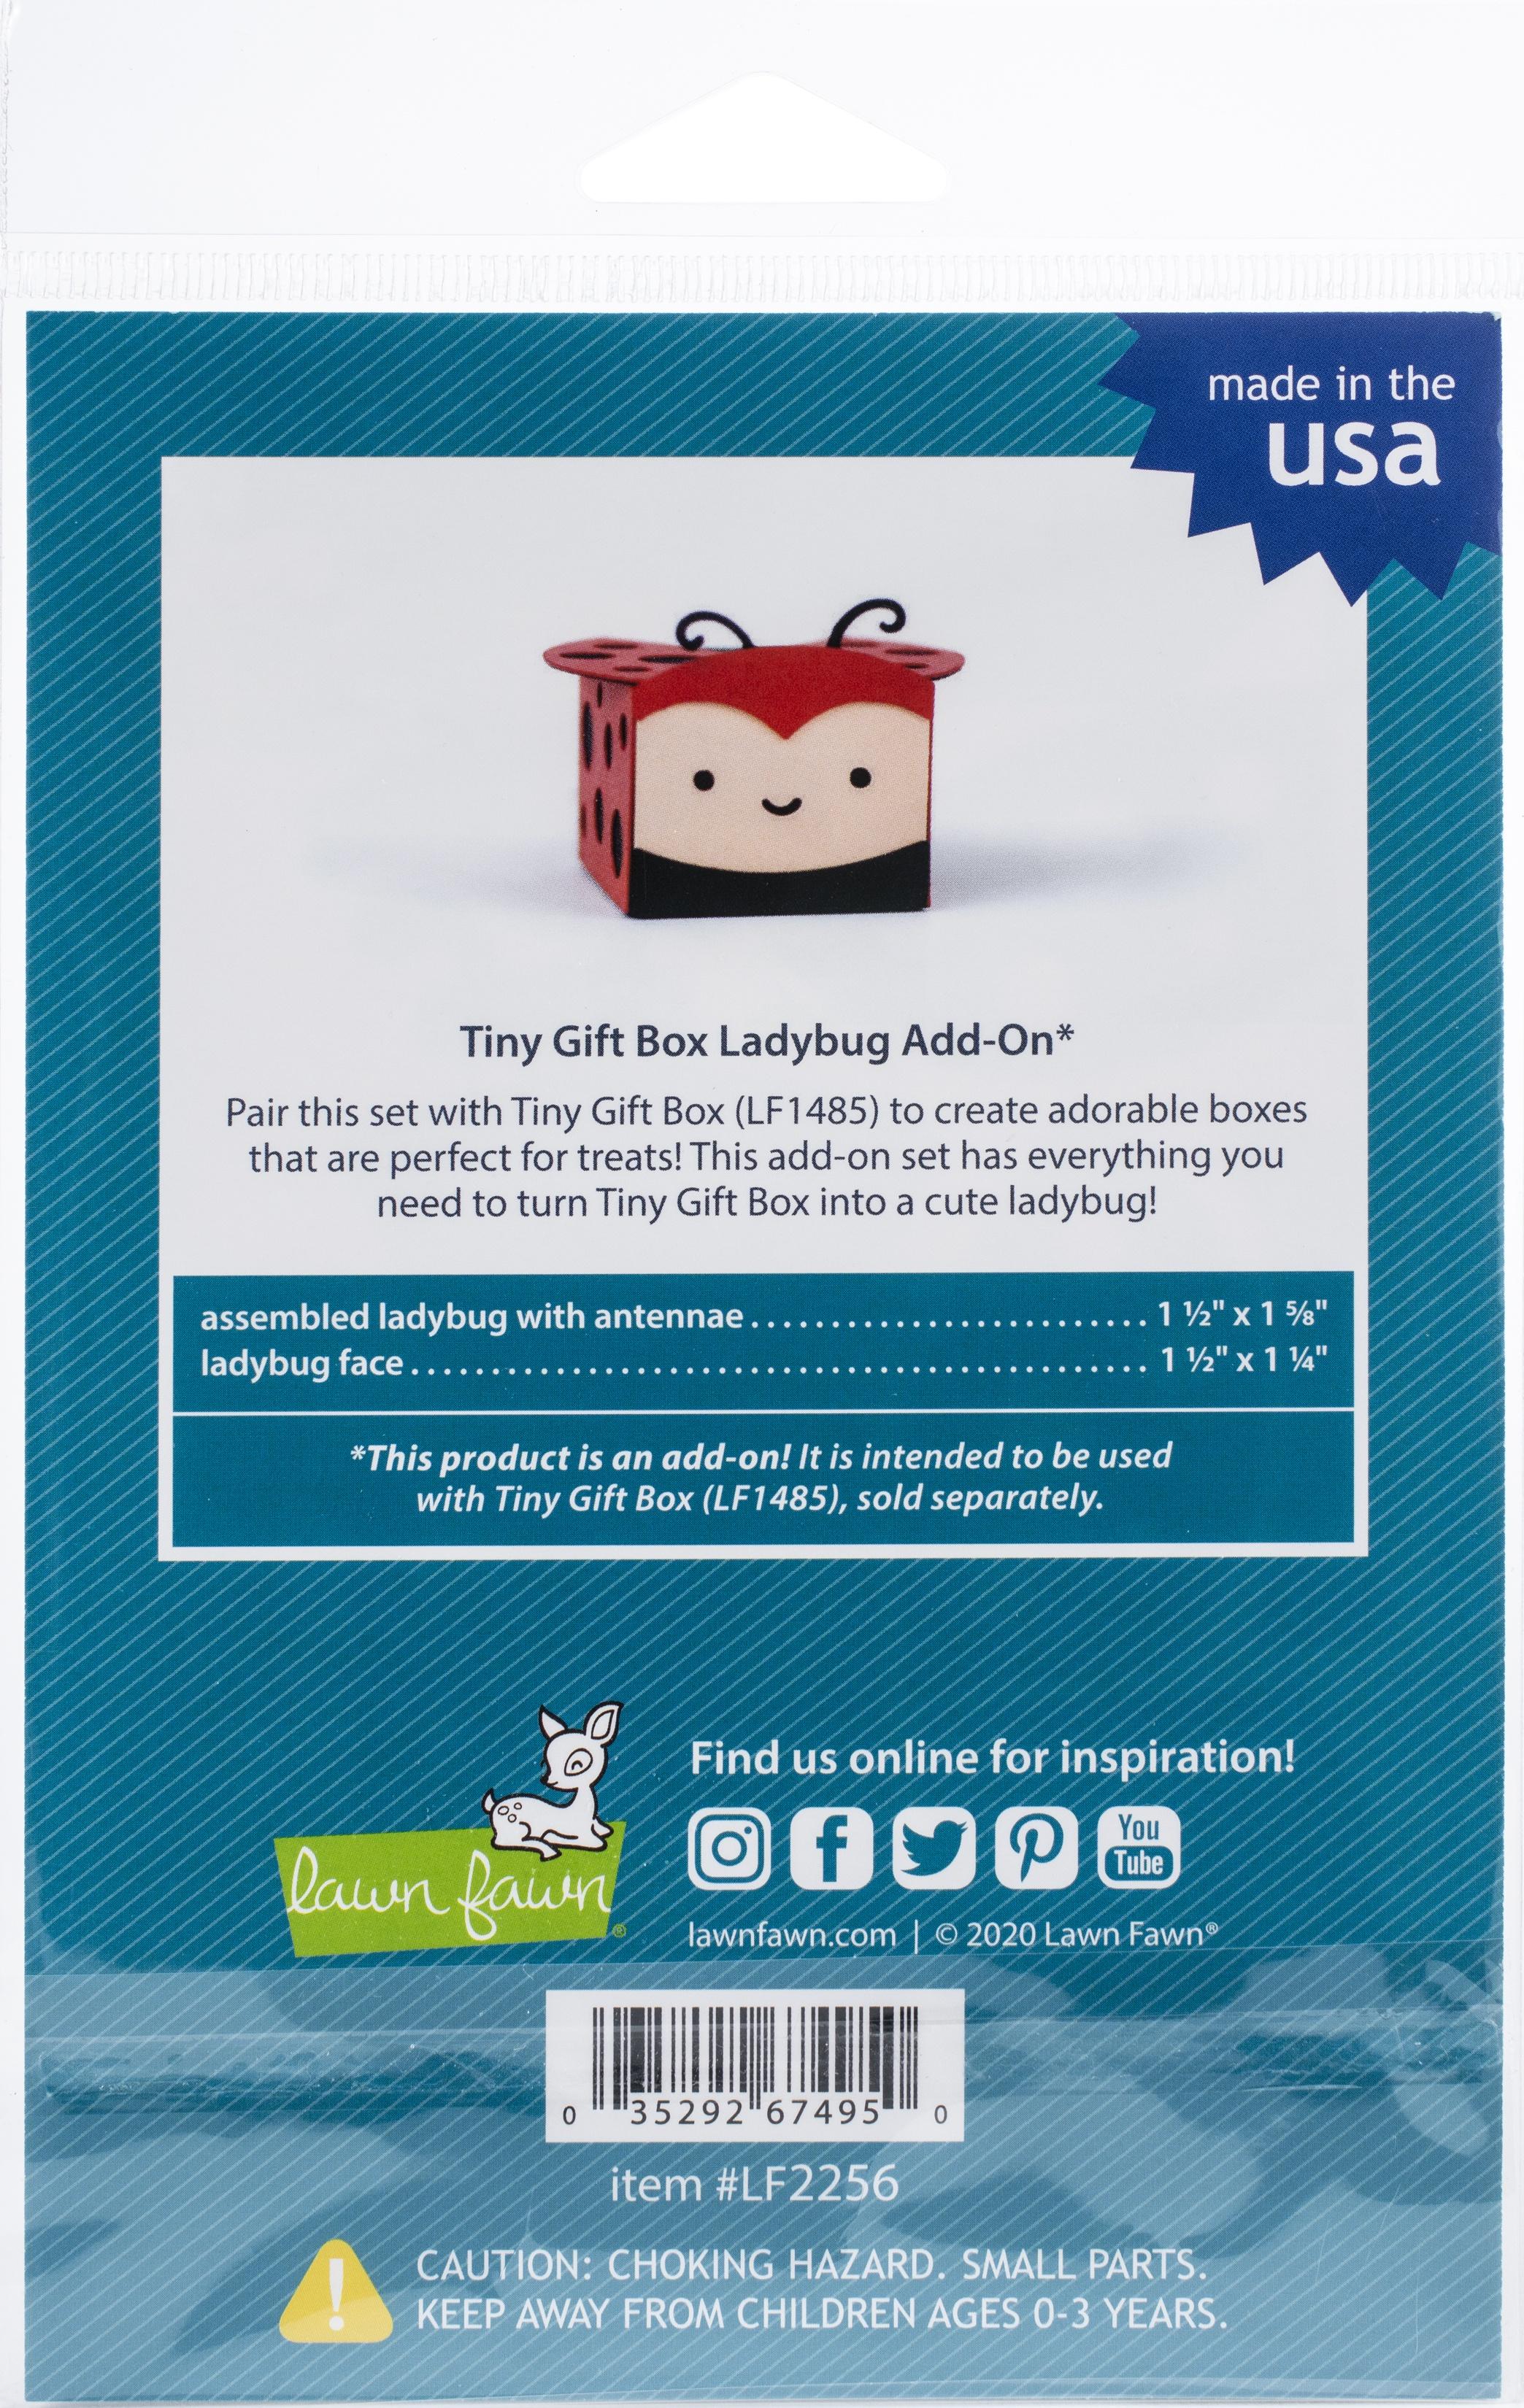 Tiny Gift Box Ladybug Add-On